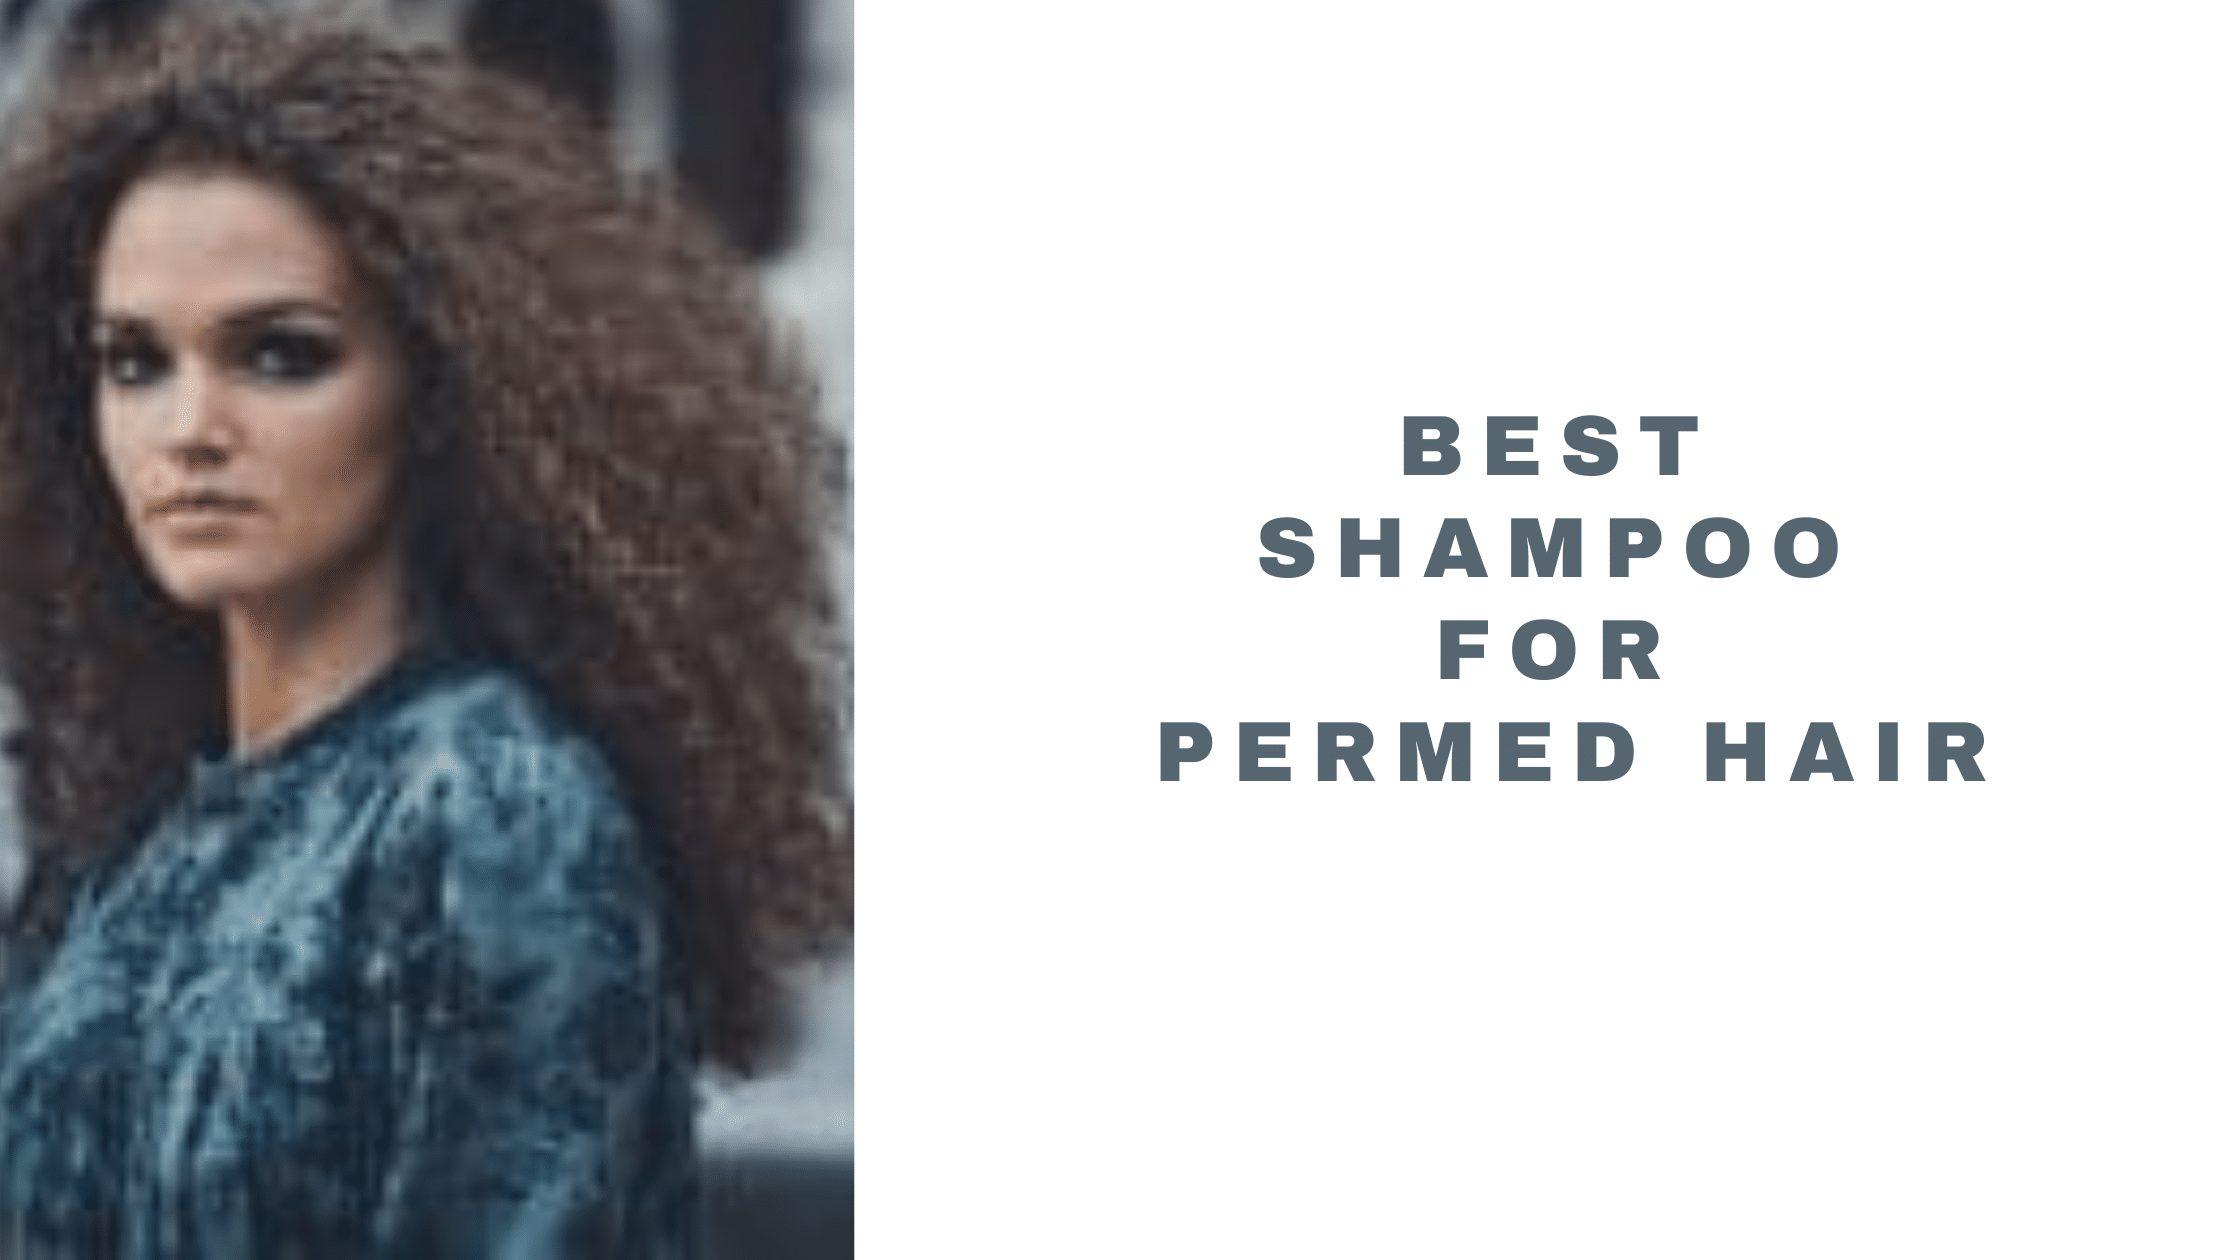 13 Best Shampoo For Permed Hair 2021